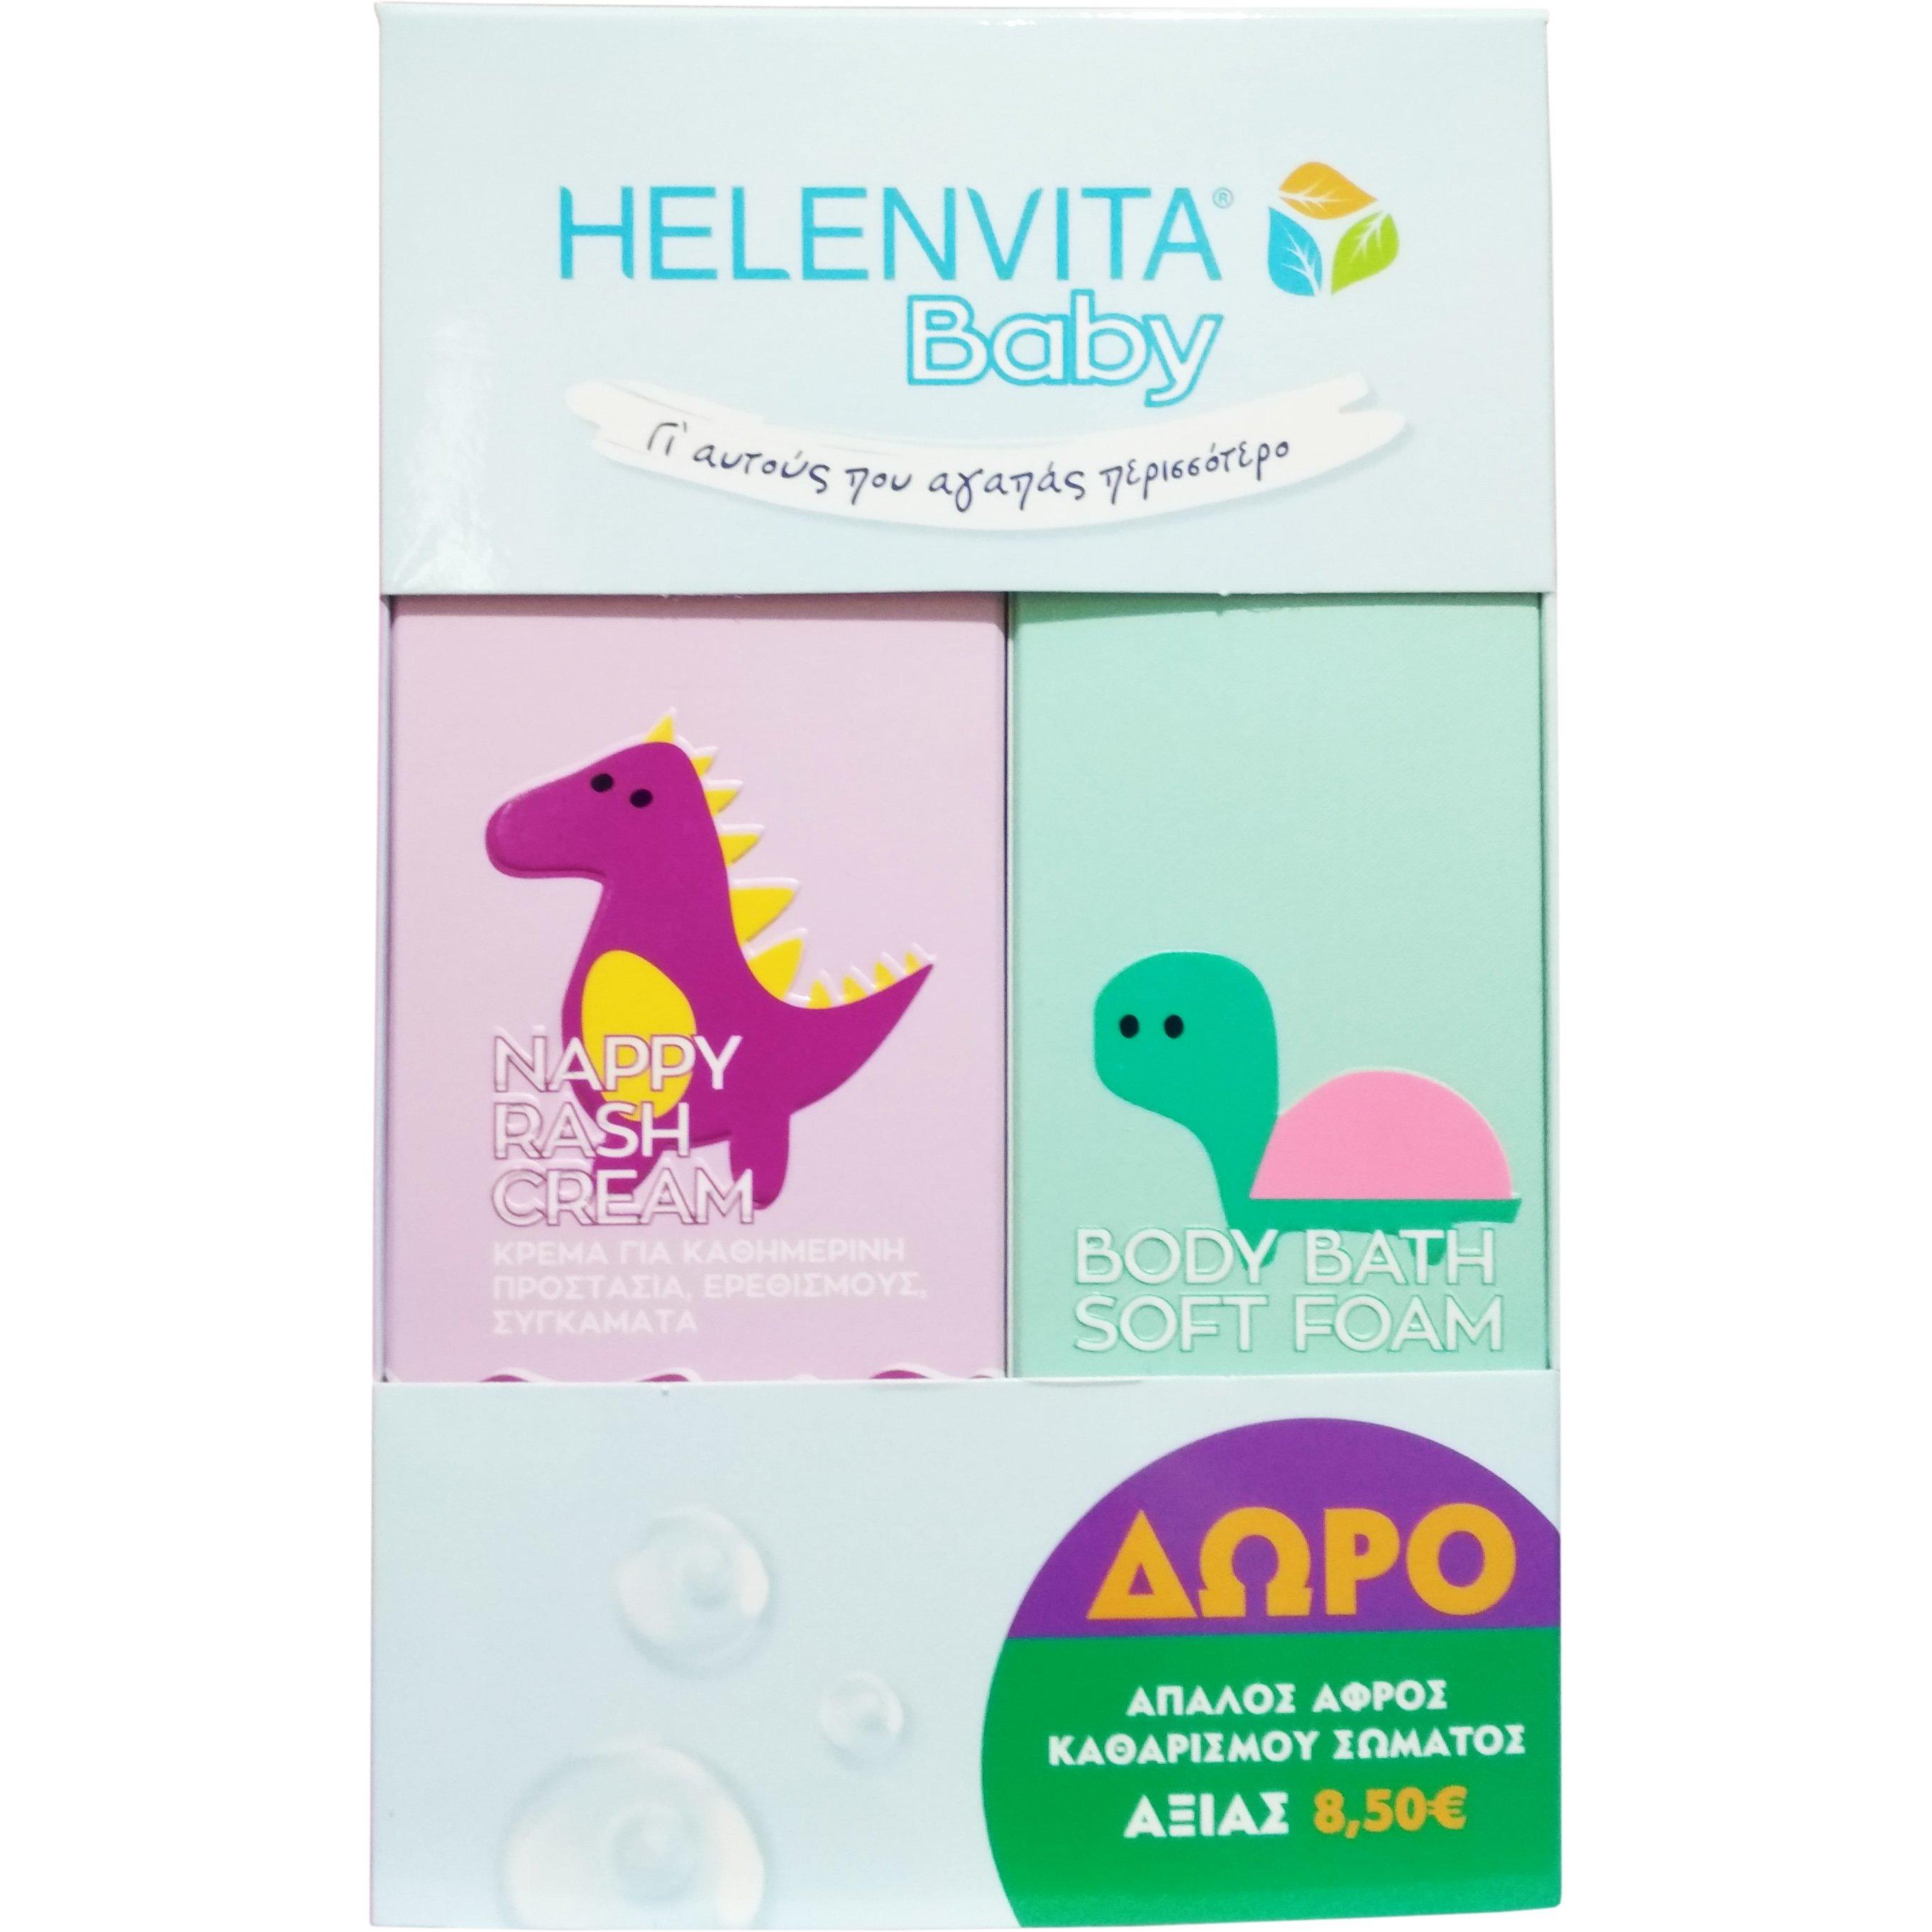 Helenvita Πακέτο Προσφοράς Baby Nappy Rash Cream Κρέμα Για Την Αλλαγή Της Πάνας  μητέρα παιδί   περιποίηση για το μωρό   αλλαγή πάνας   σύγκαμα για το μωρό